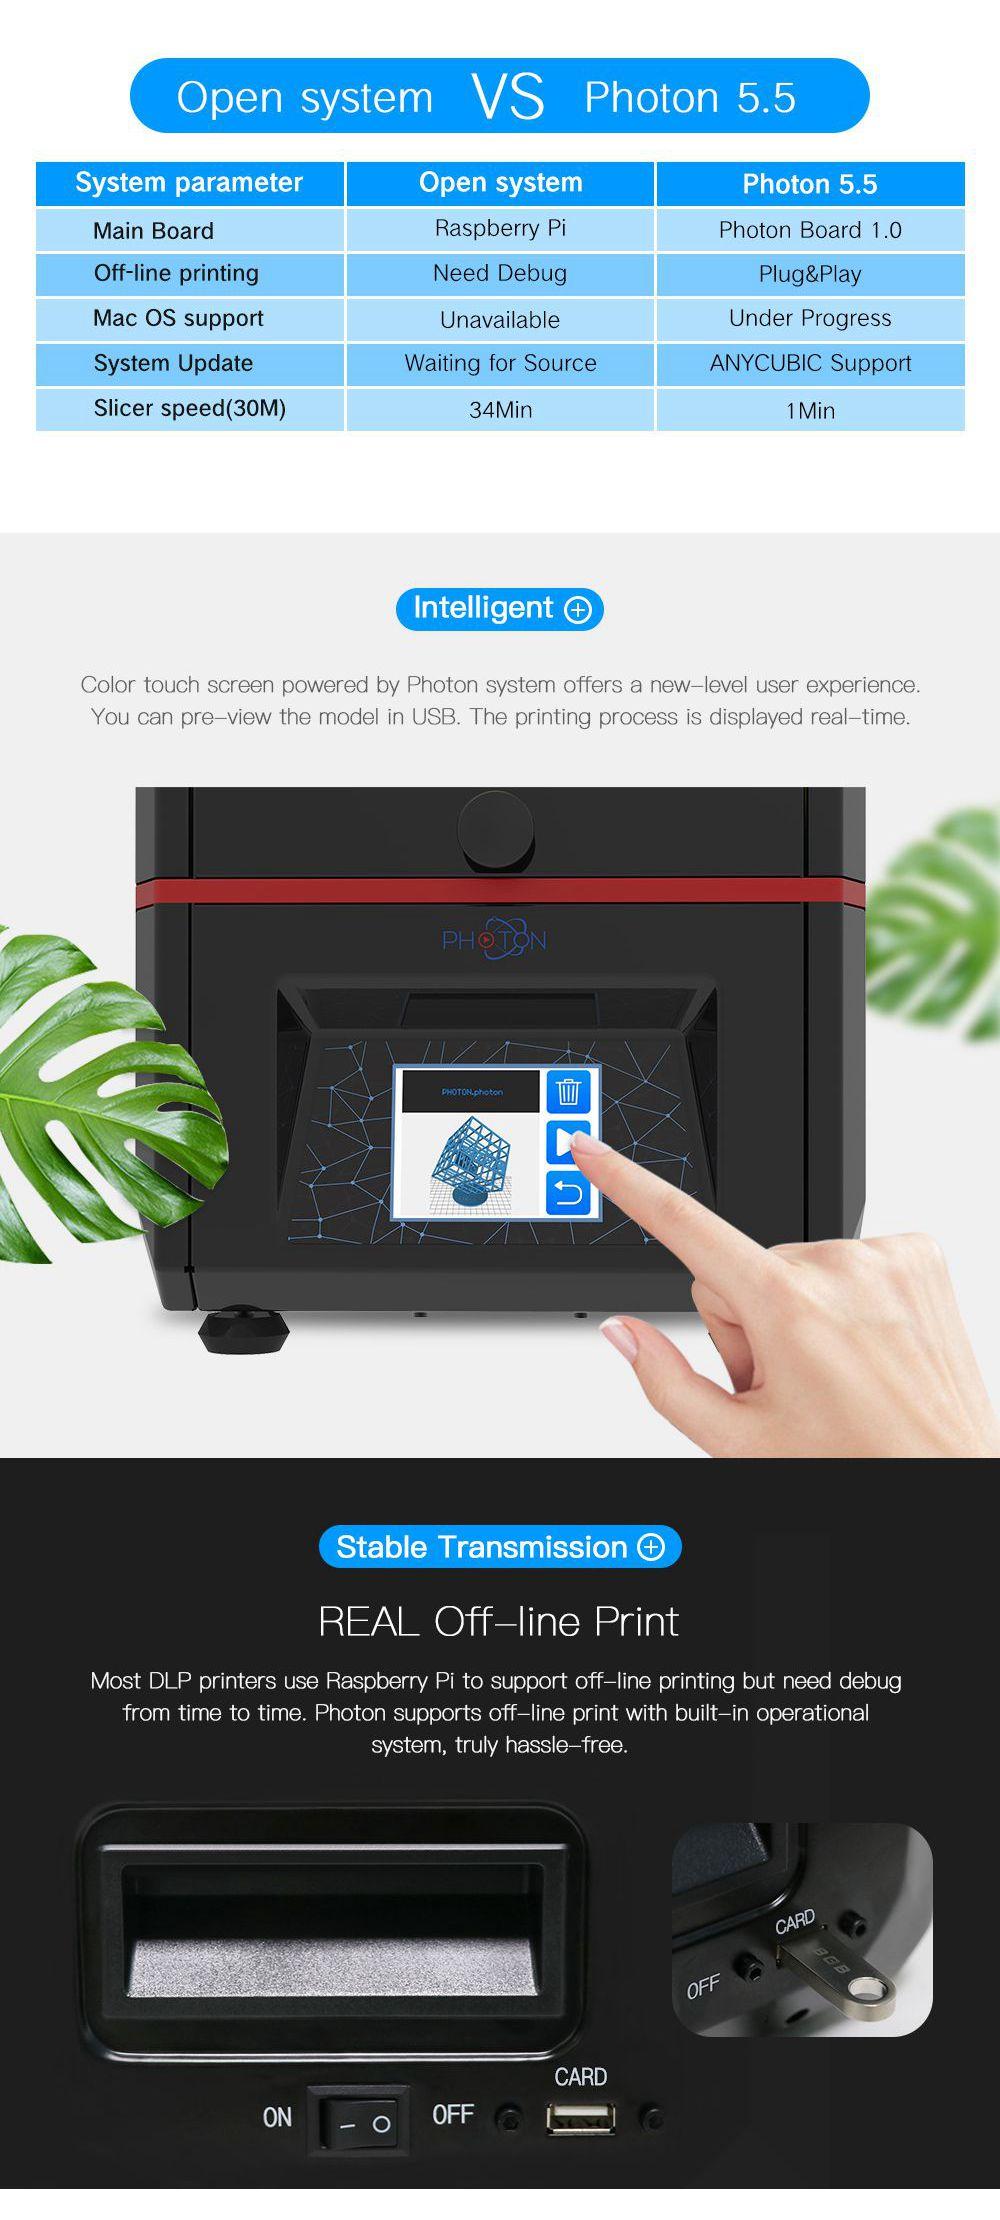 3d-drucker Und 3d-scanner Büroelektronik Anycubic 3d Drucker Kit Photon 2l Harz Fep Film Plus Größe Uv-led Touchscreen Sla Uv Harz Impresora 3d Drucker Impressora